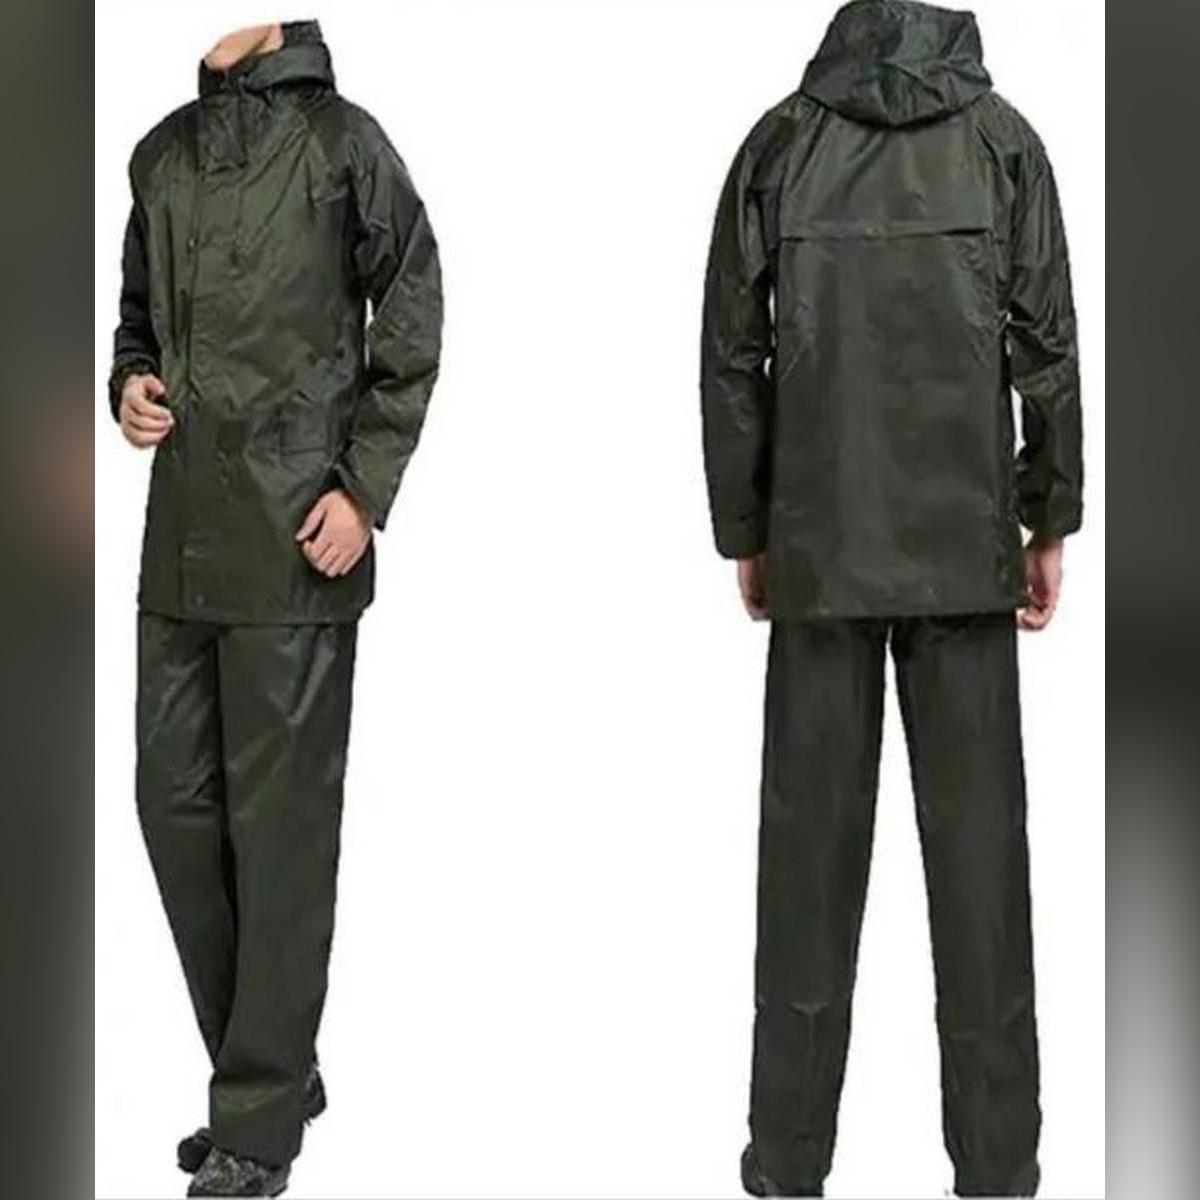 Rainfreem Raincoat Suit Impermeable Women/Men Hooded Motorcycle Poncho Motorcycle Rainwear  Lite Waterproof Rain Suit / Rain Coat / Outdoor Activities / Rain Wear / Bike Suit / Jacket Pant